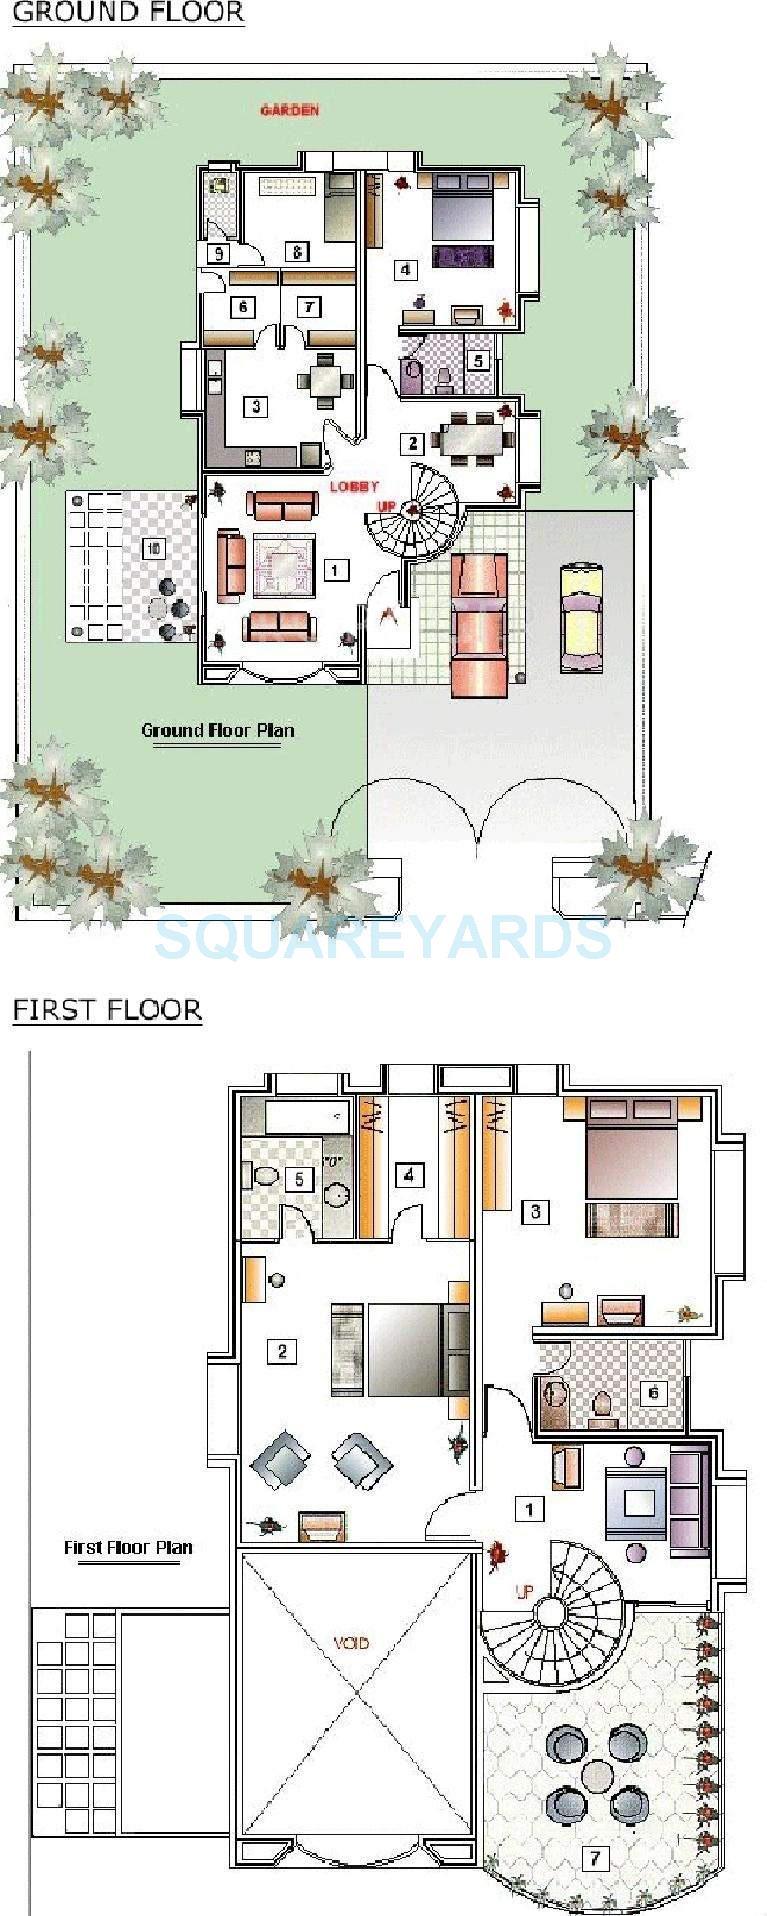 clover hills villa 3bhk 2880sqft 11603